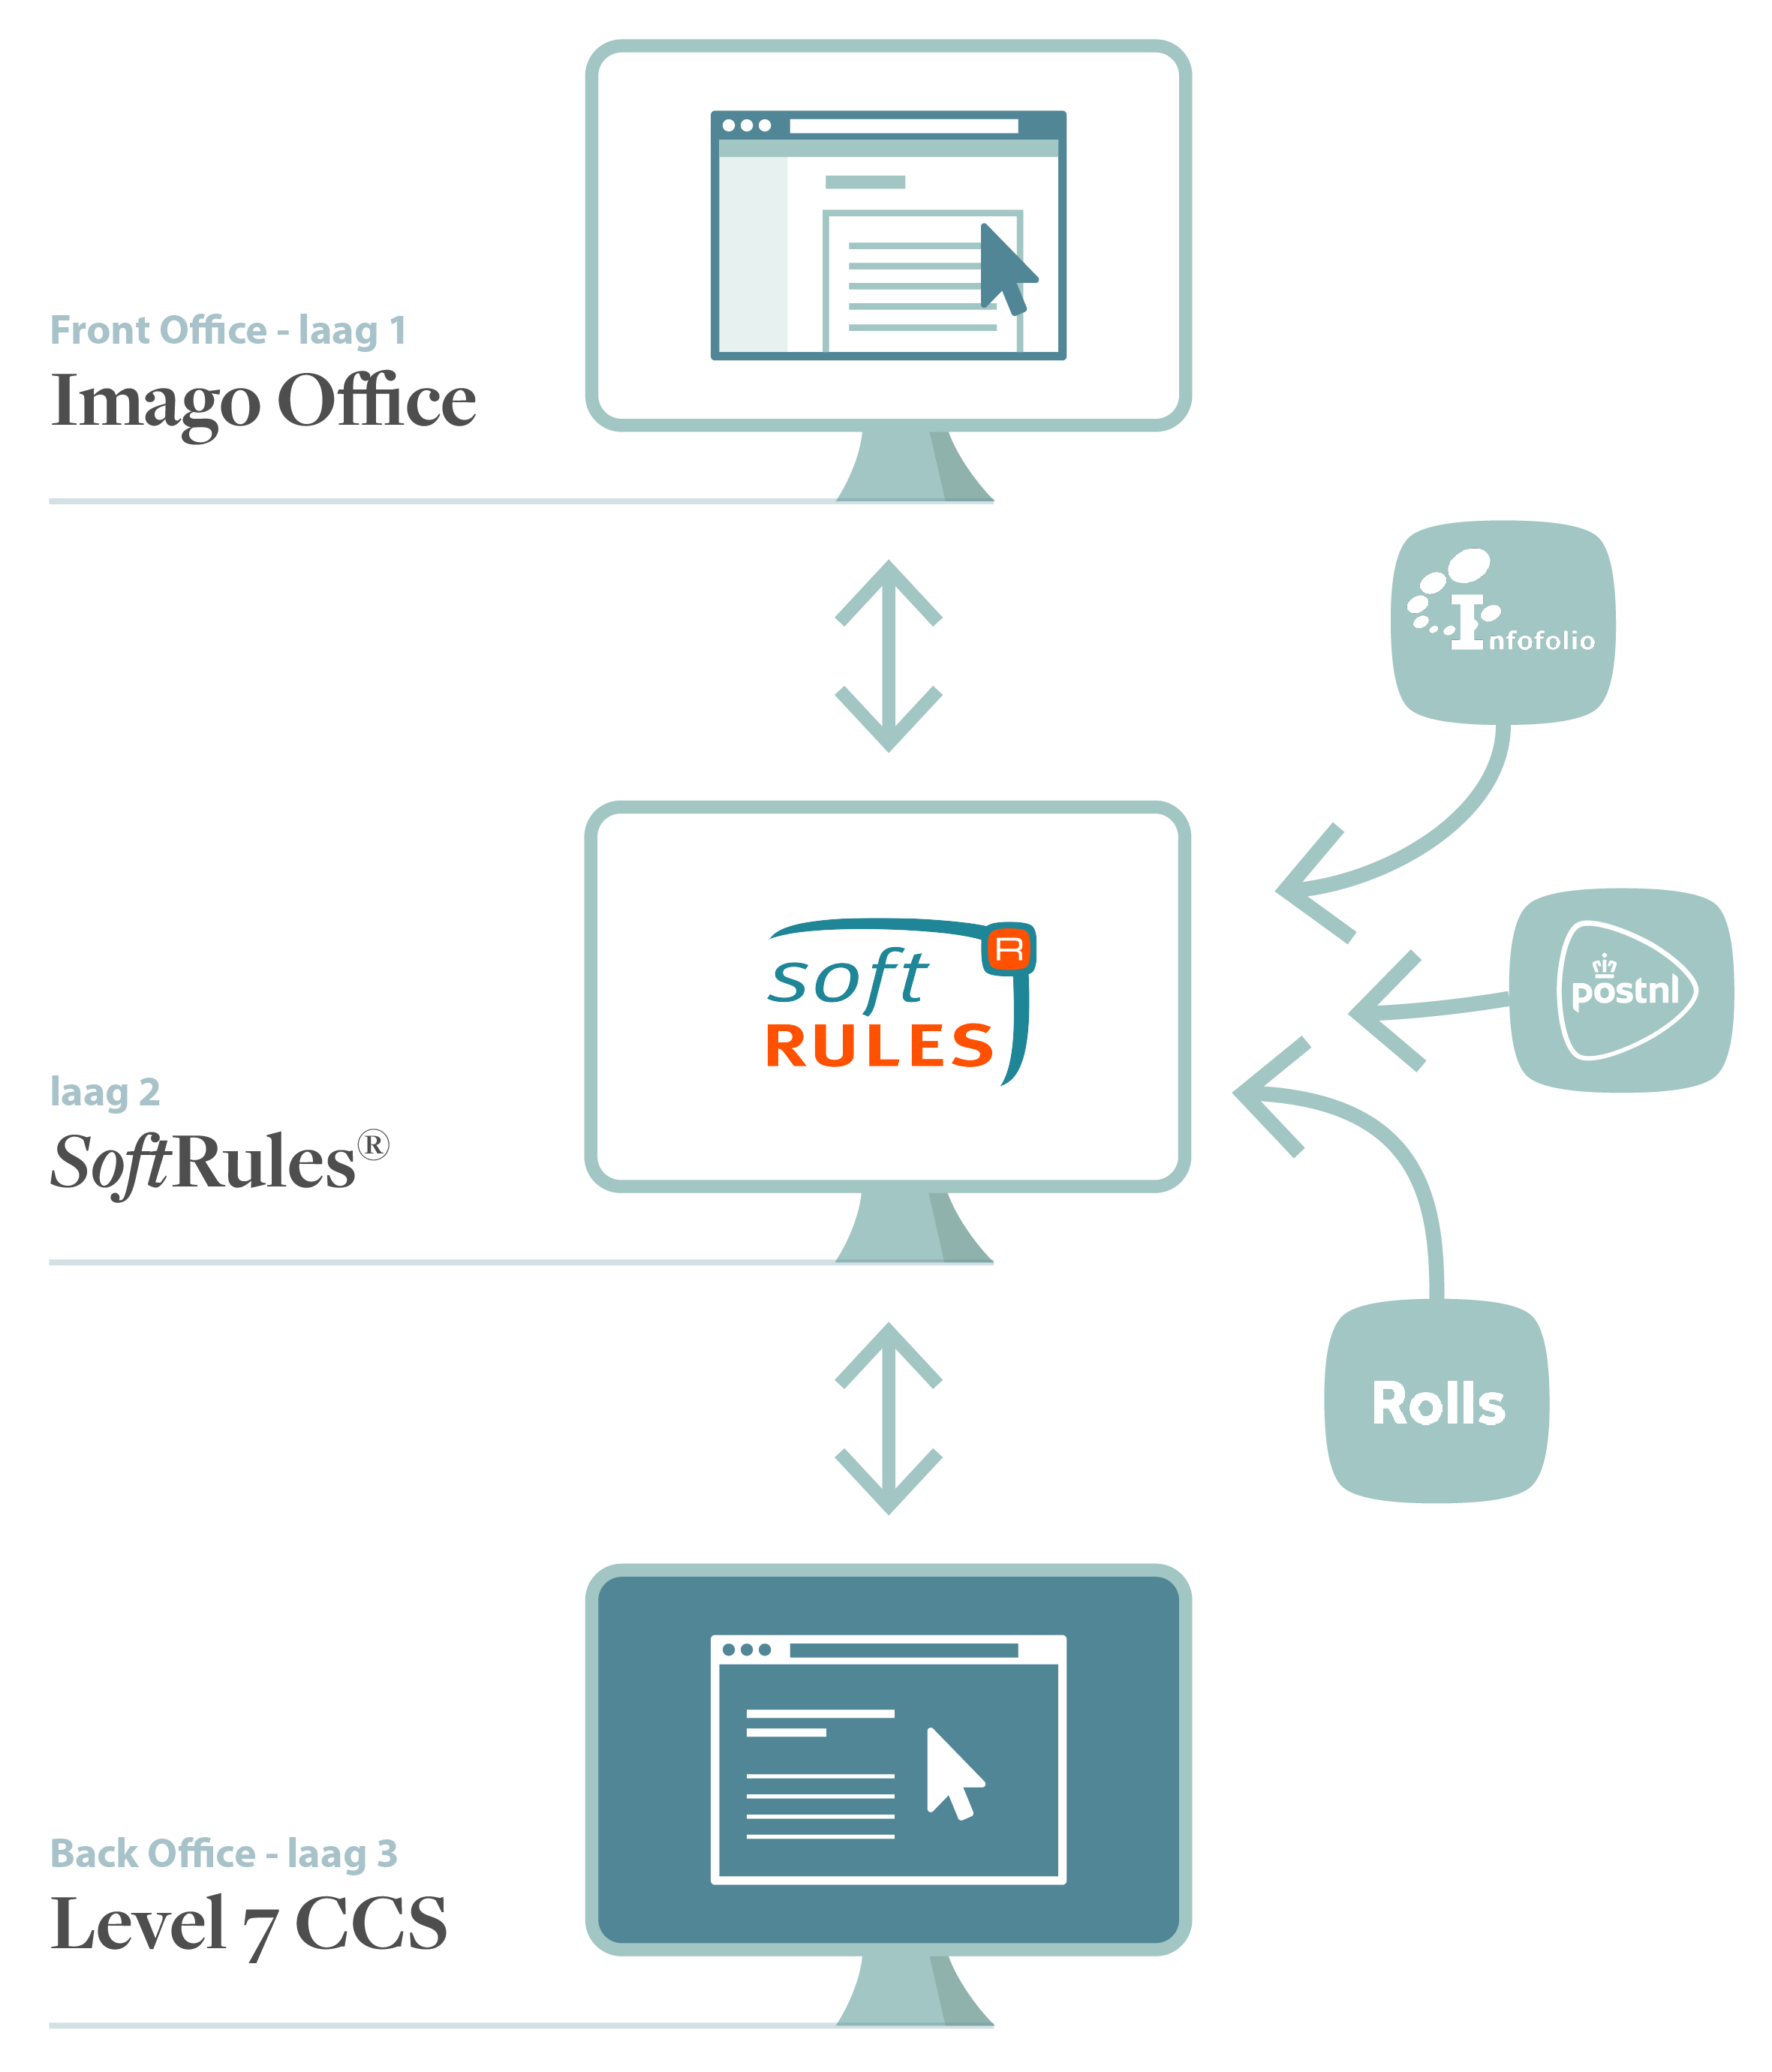 SoftRules - DAK verzekeringen case 3-laags architectuur